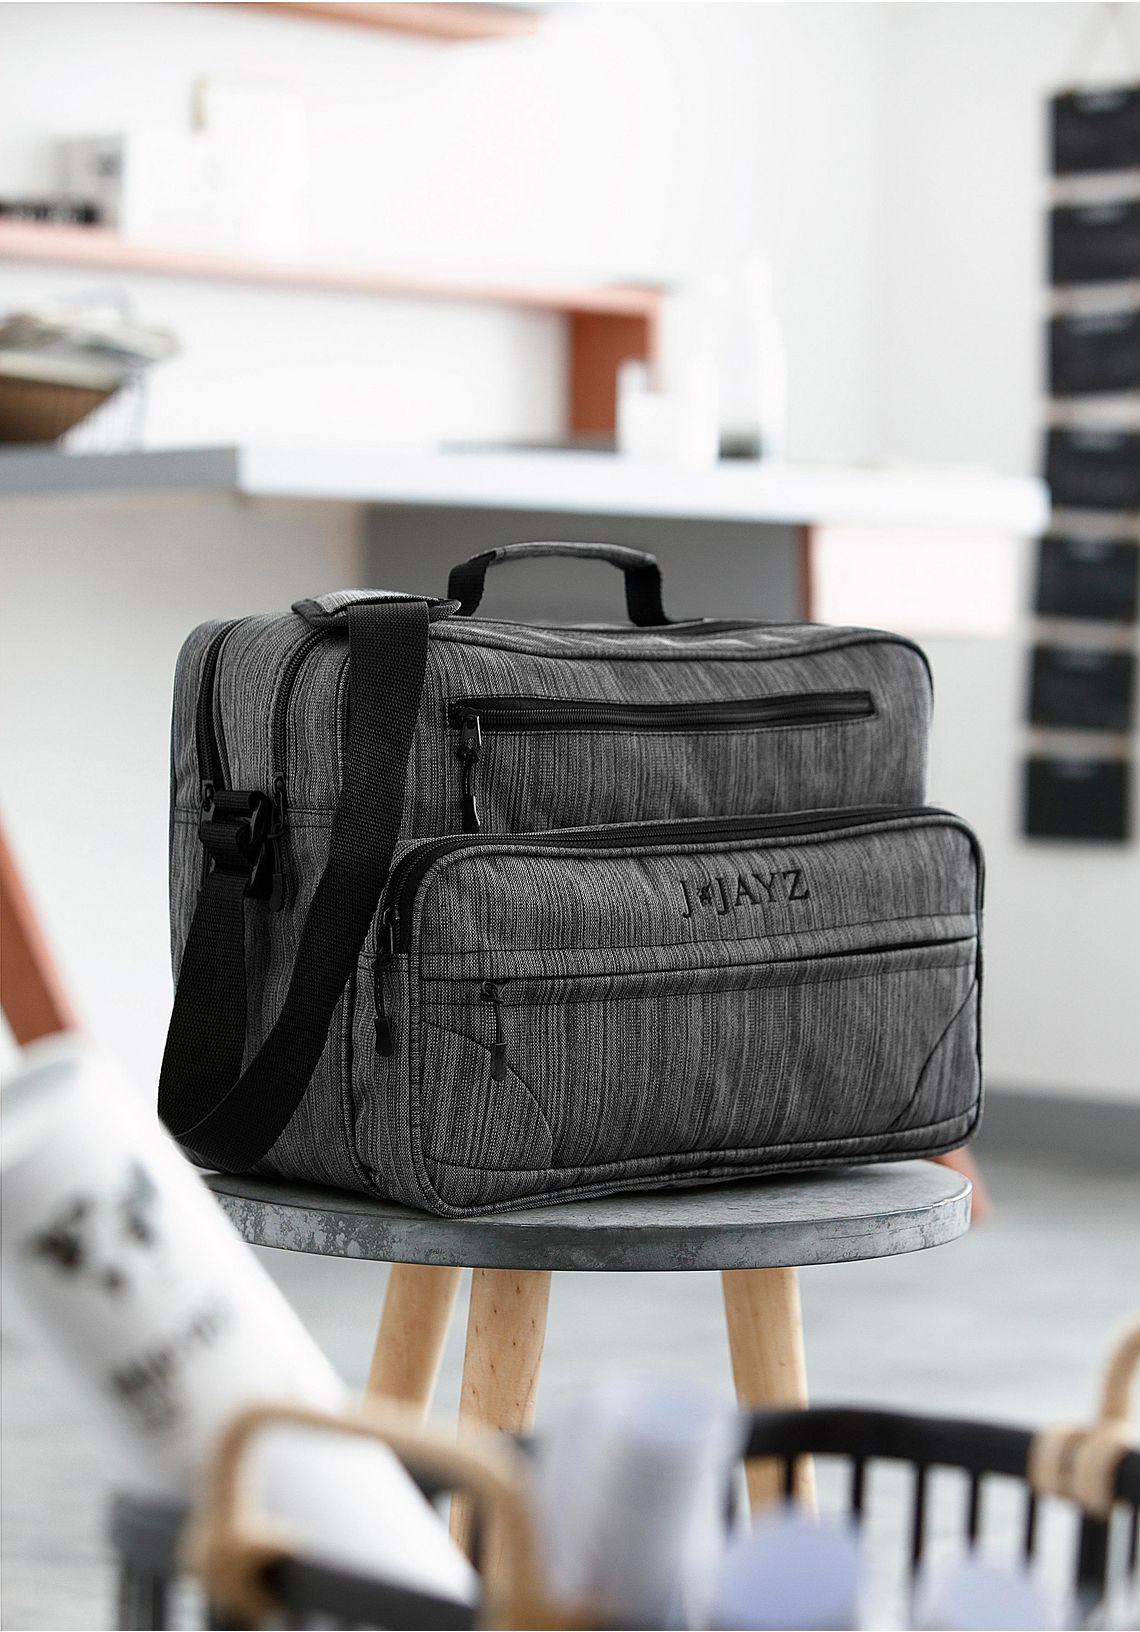 J.Jayz schoudertas online shoppen  grijs/zwart